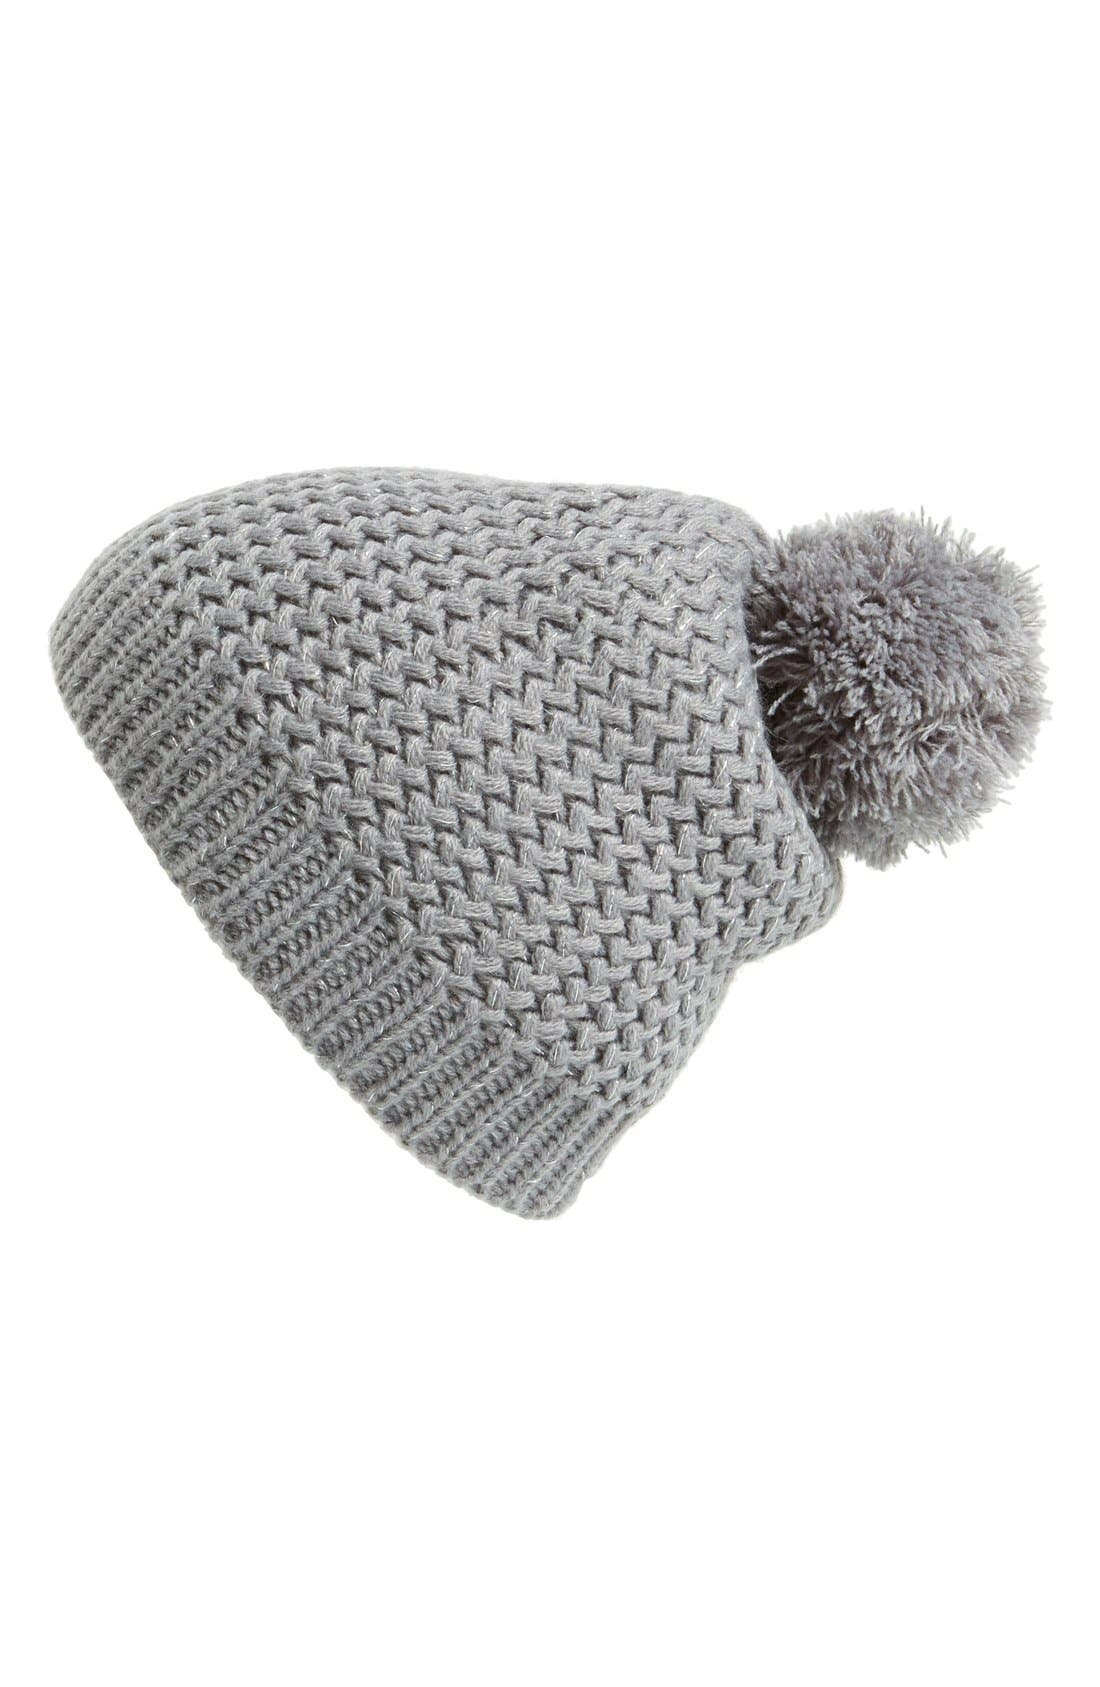 Main Image - Capelli of New York Metallic Knit Beanie